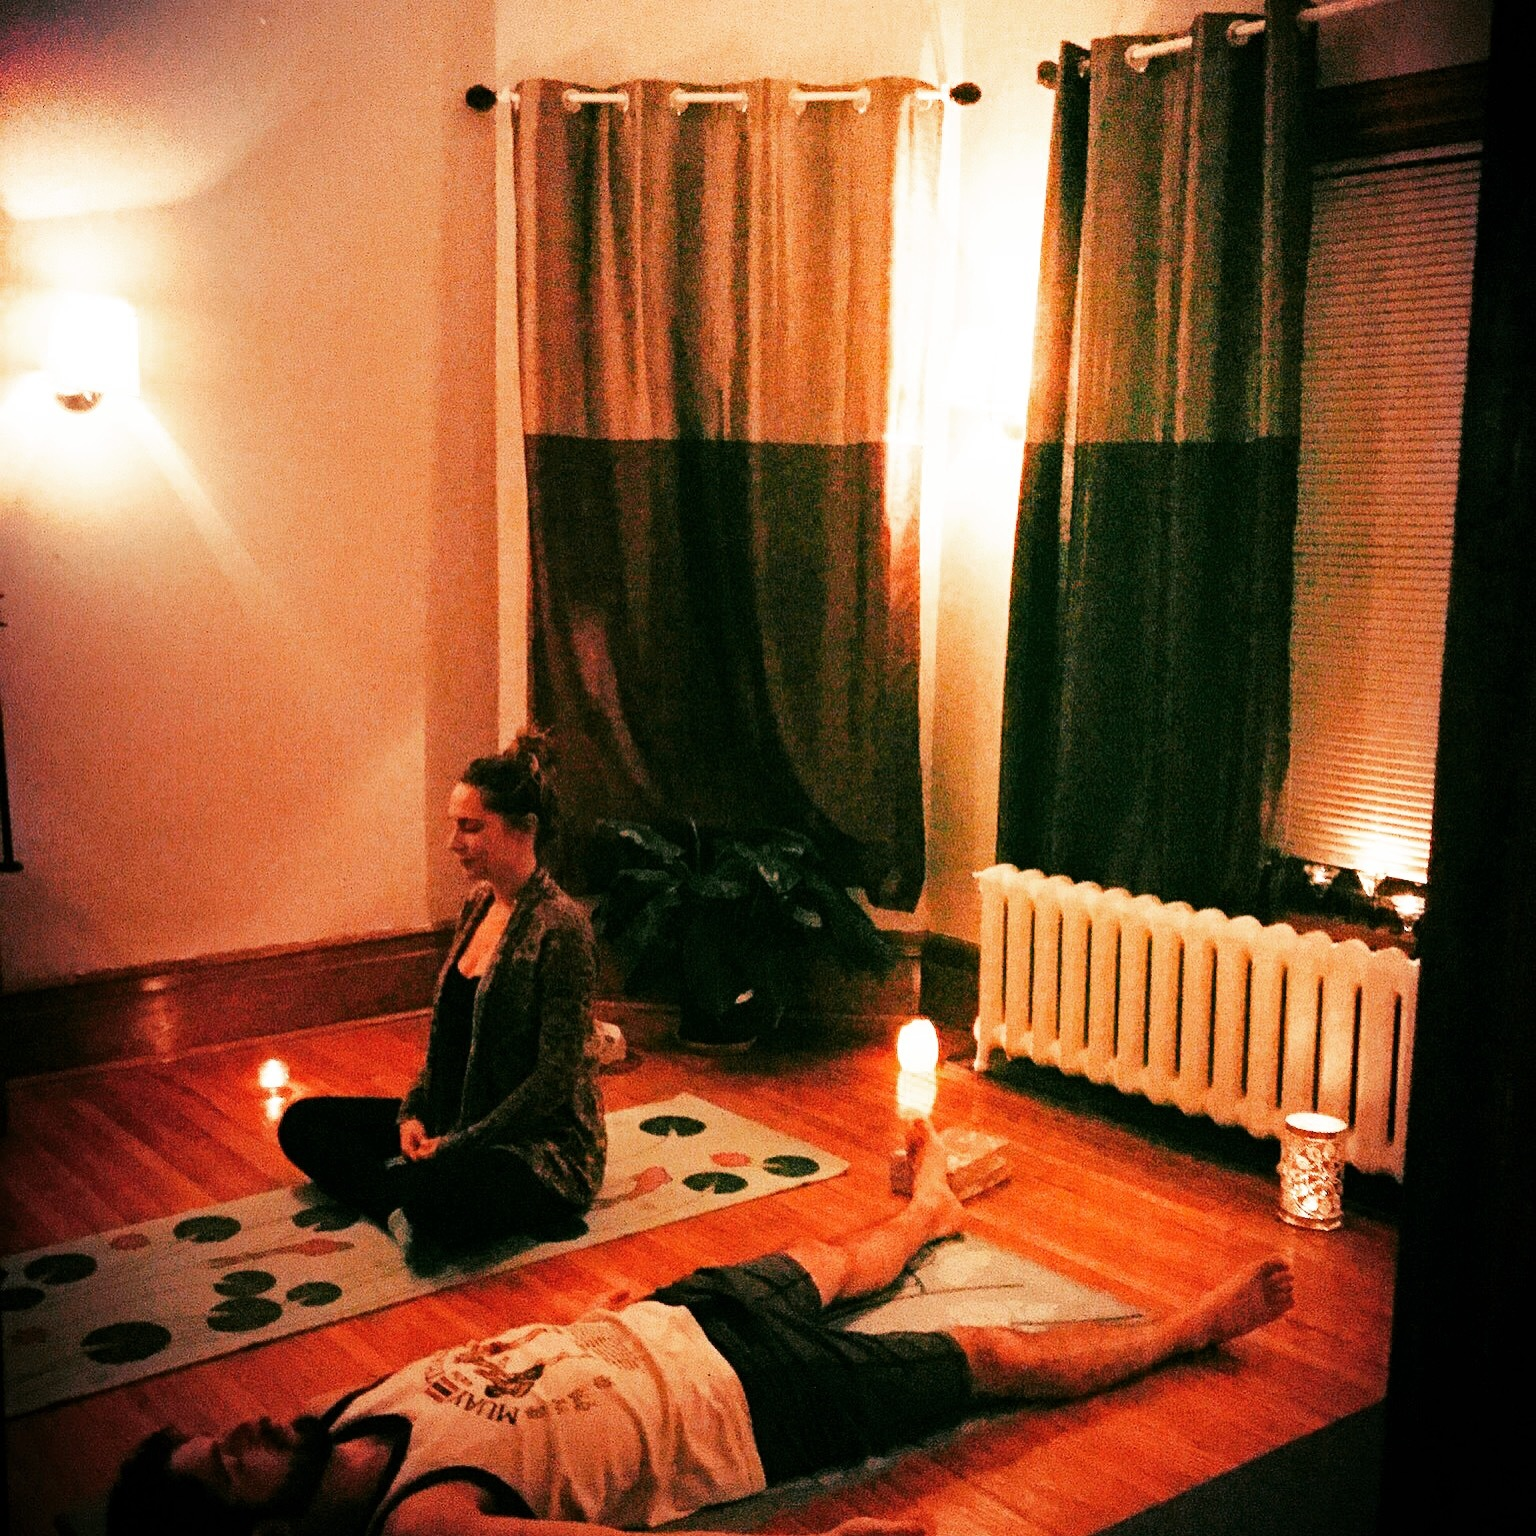 yoga studio, Yin, small class, kitchener, Waterloo